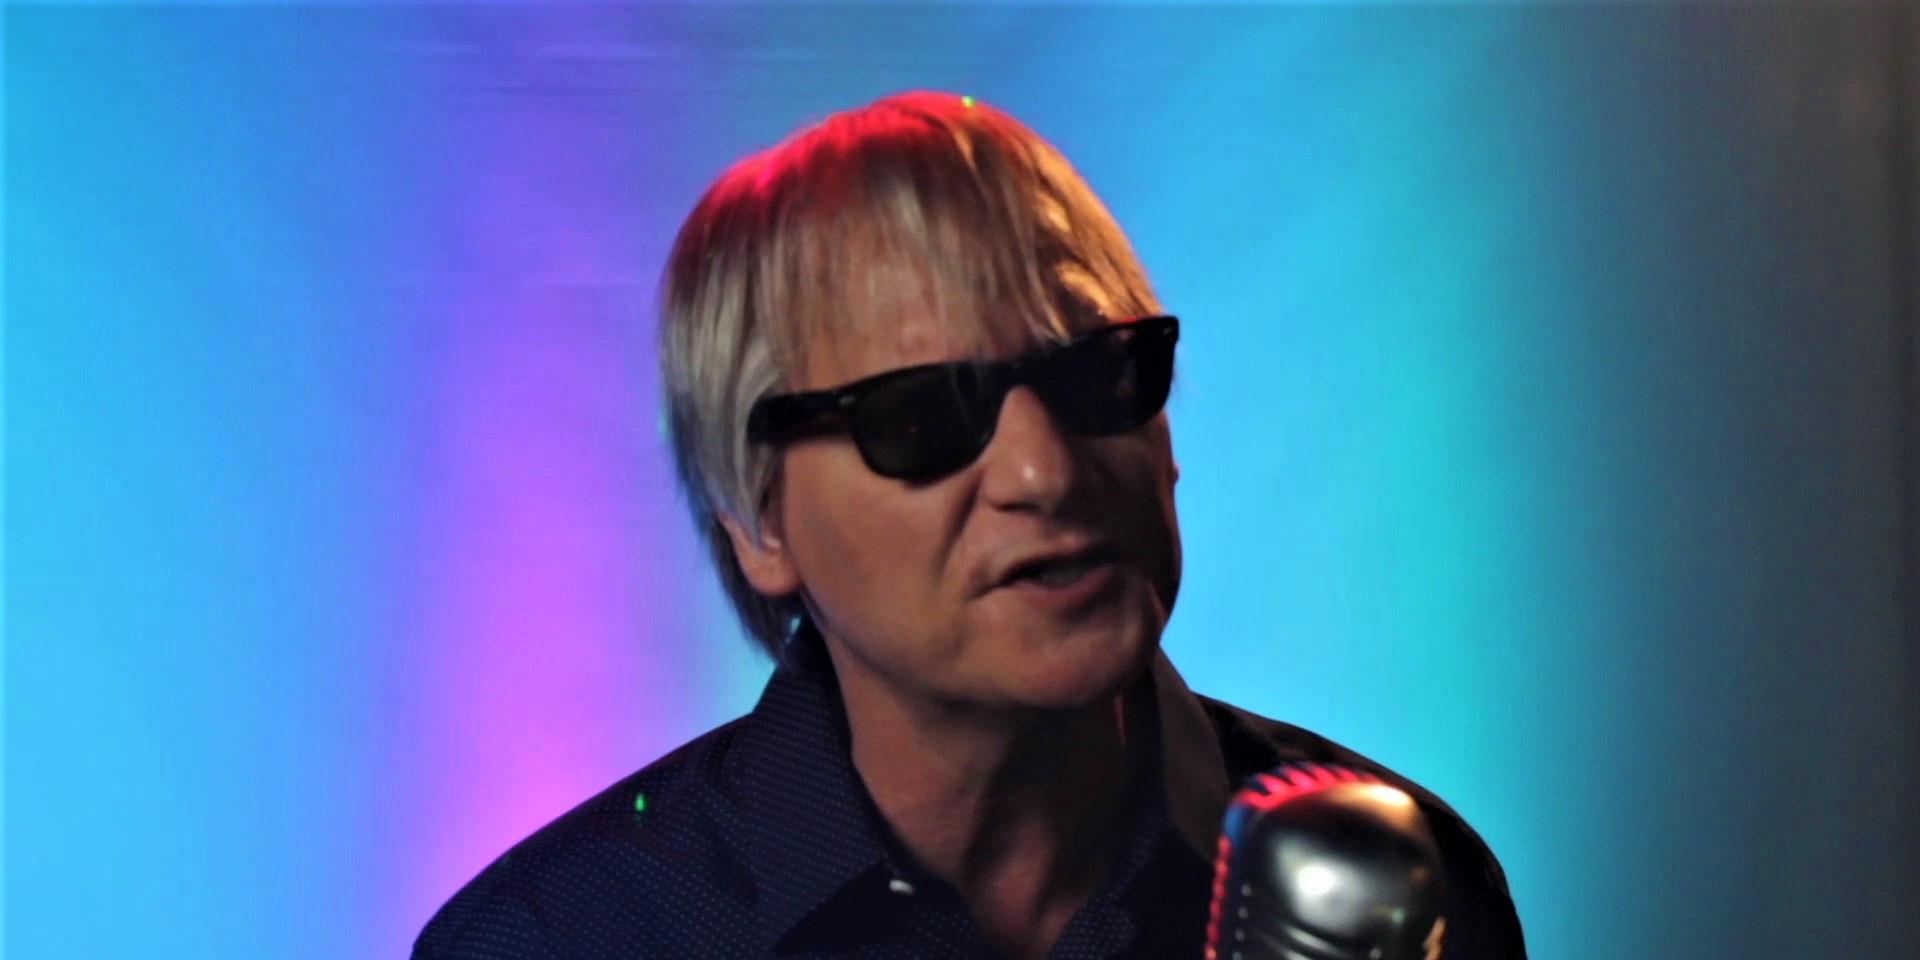 Photo credit John Morand www.soundofmusicRVA.com